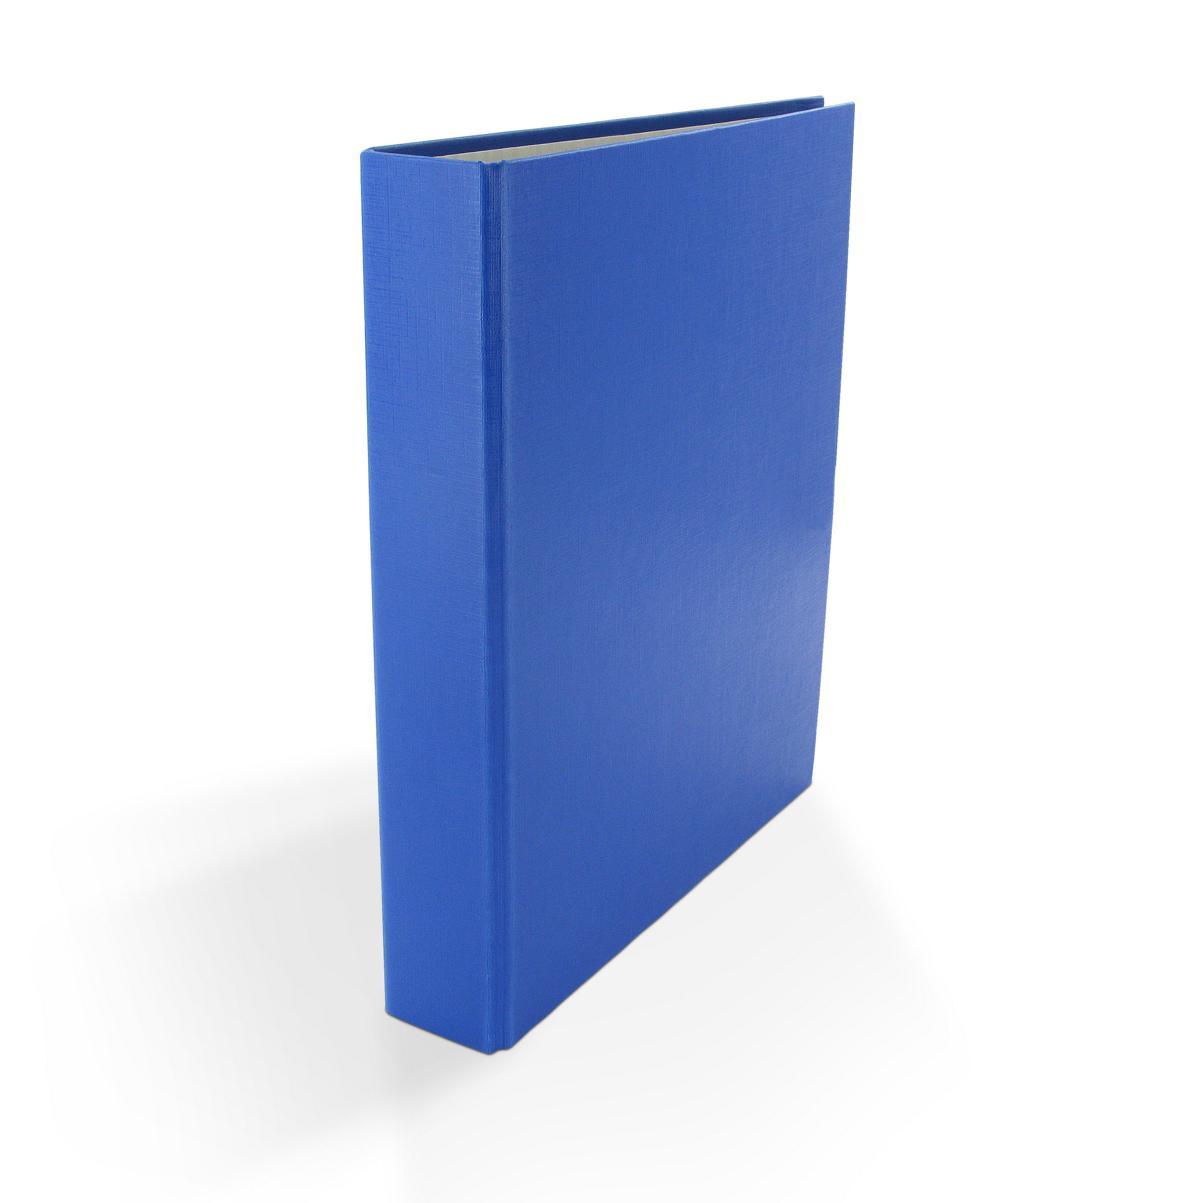 3x Ringbuch DIN A4 2-Ring Ordner Farbe rot und blau je 1x schwarz